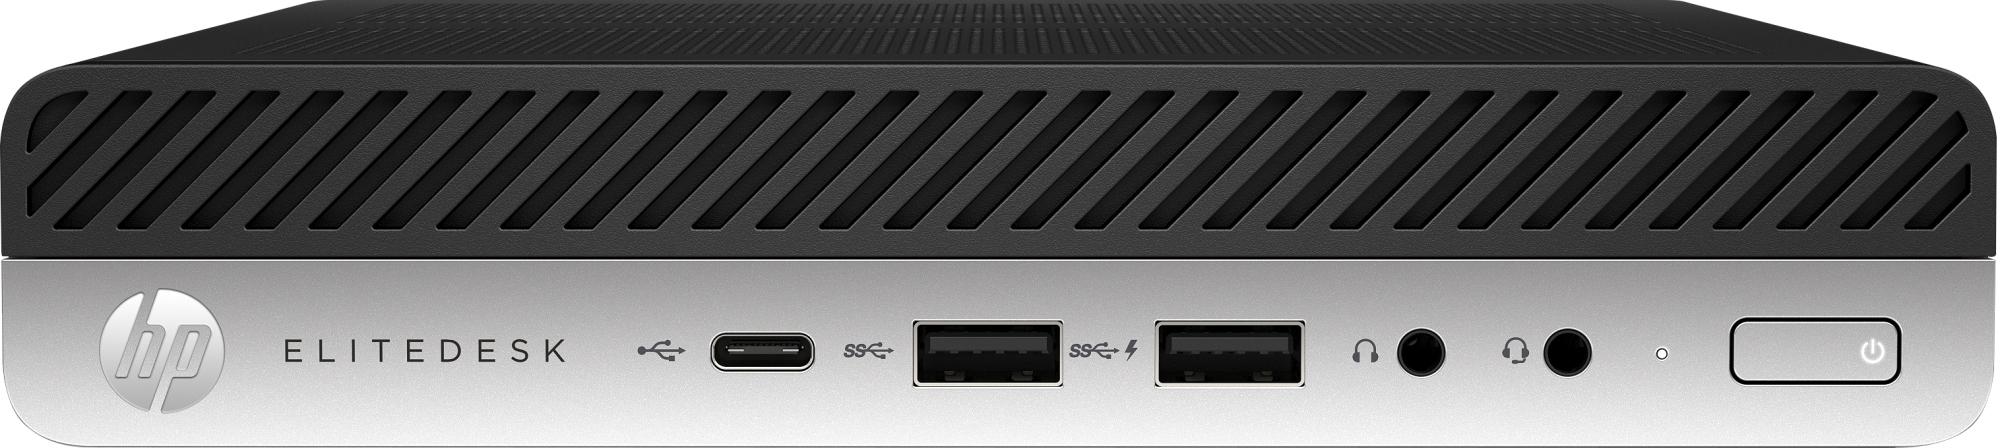 Elitedesk 705 G5 Amd Ryzen 5 Pro 3400ge 8 Gb Ddr4-sdram 256 Gb Ssd Mini Pc Negro Windows 10 Pro